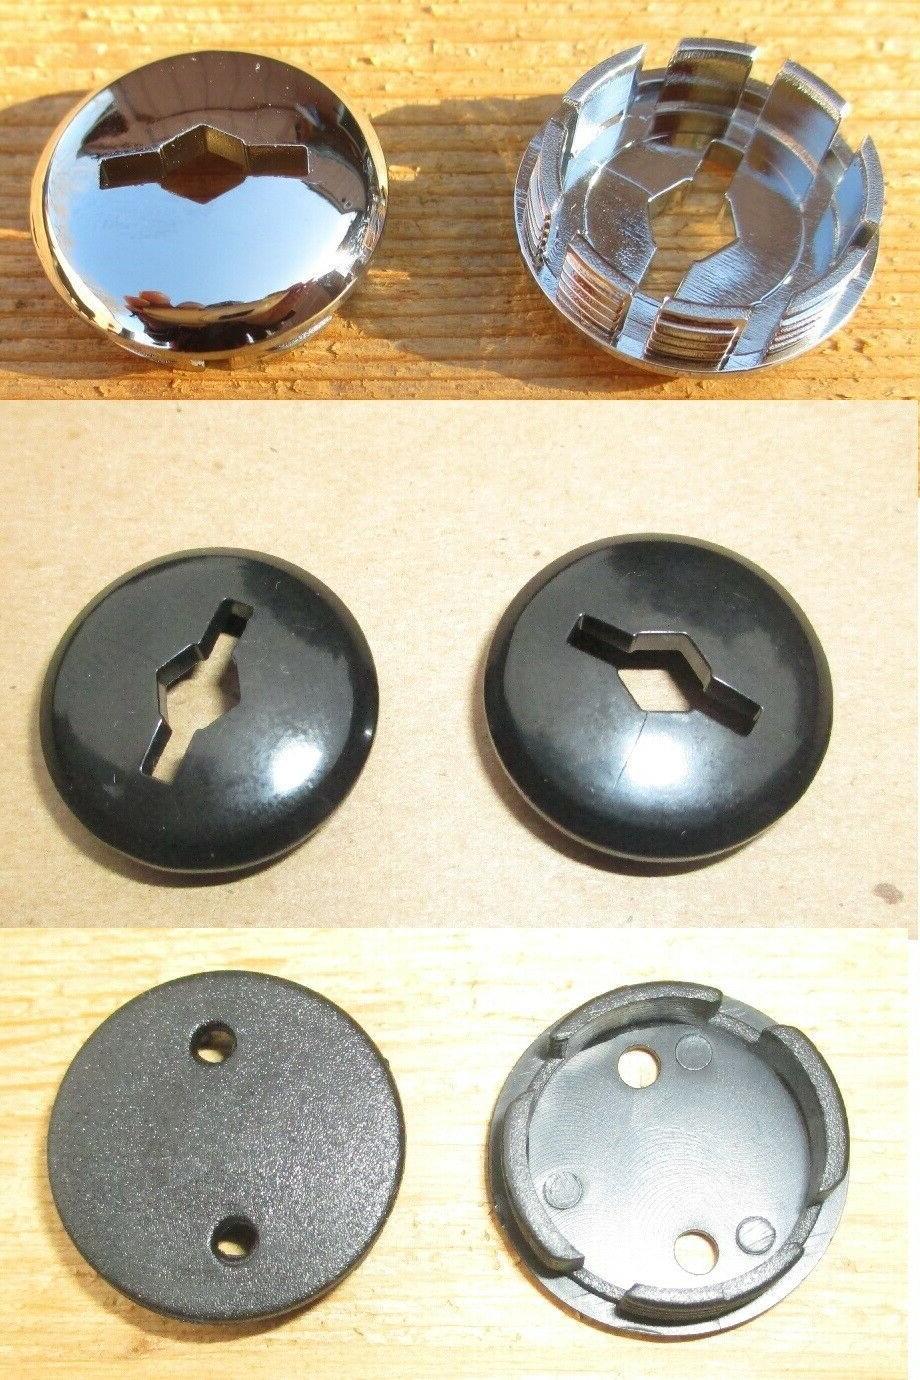 Bicycle Bottom Bracket Crank Arm Dust Cover Caps Set of 2 Chrome or Black